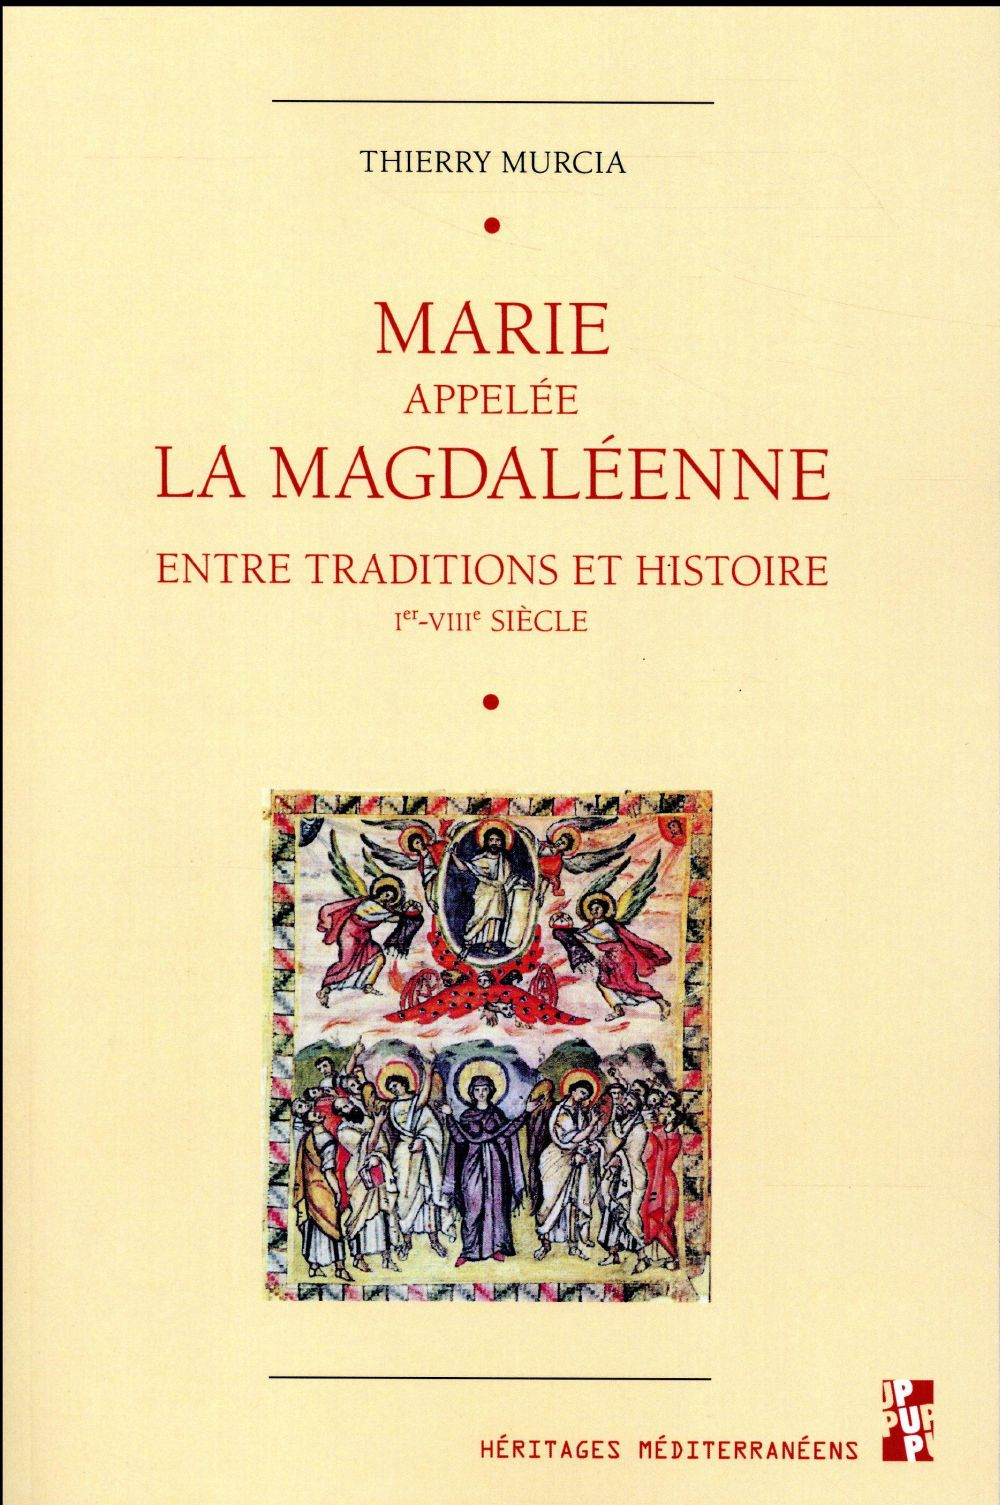 MARIE APPELEE LA MAGDALEENNE - ENTRE TRADITIONS ET HISTOIRE IER-VIIIE SIECLE